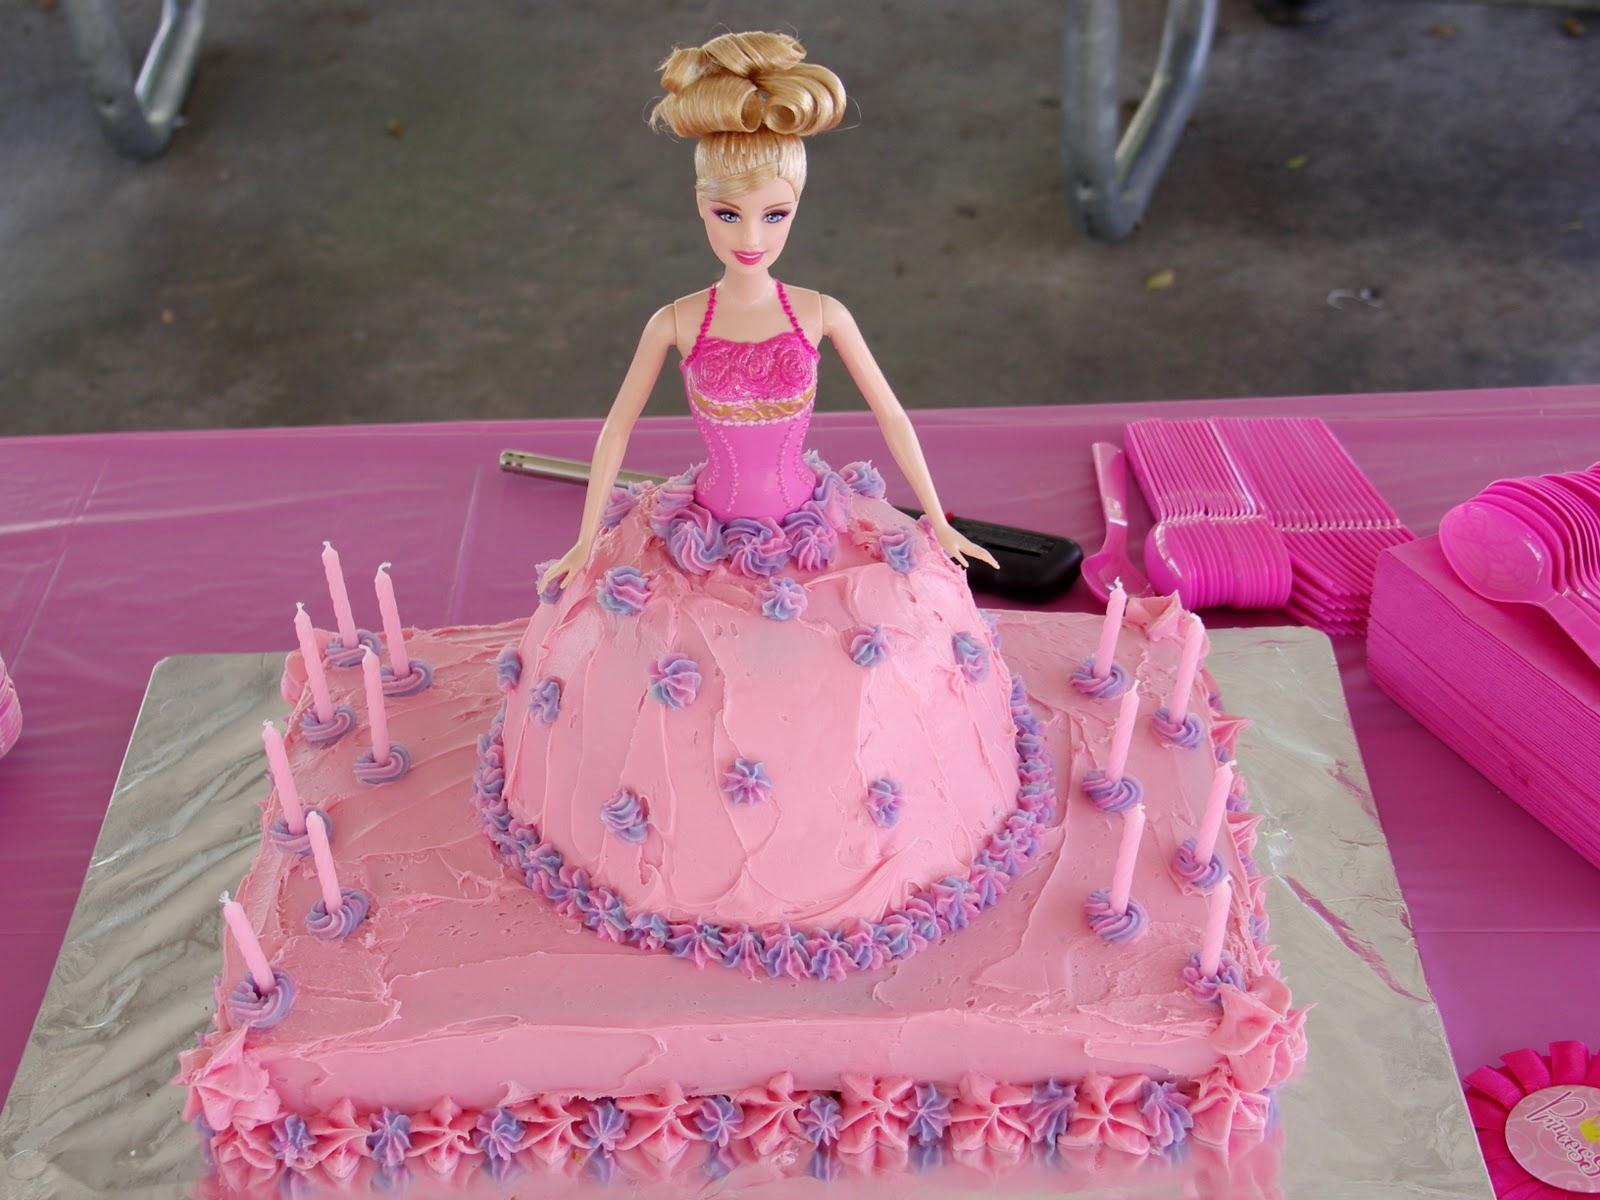 Brilliant Barbie Cakes Decoration Ideas Little Birthday Cakes Birthday Cards Printable Opercafe Filternl